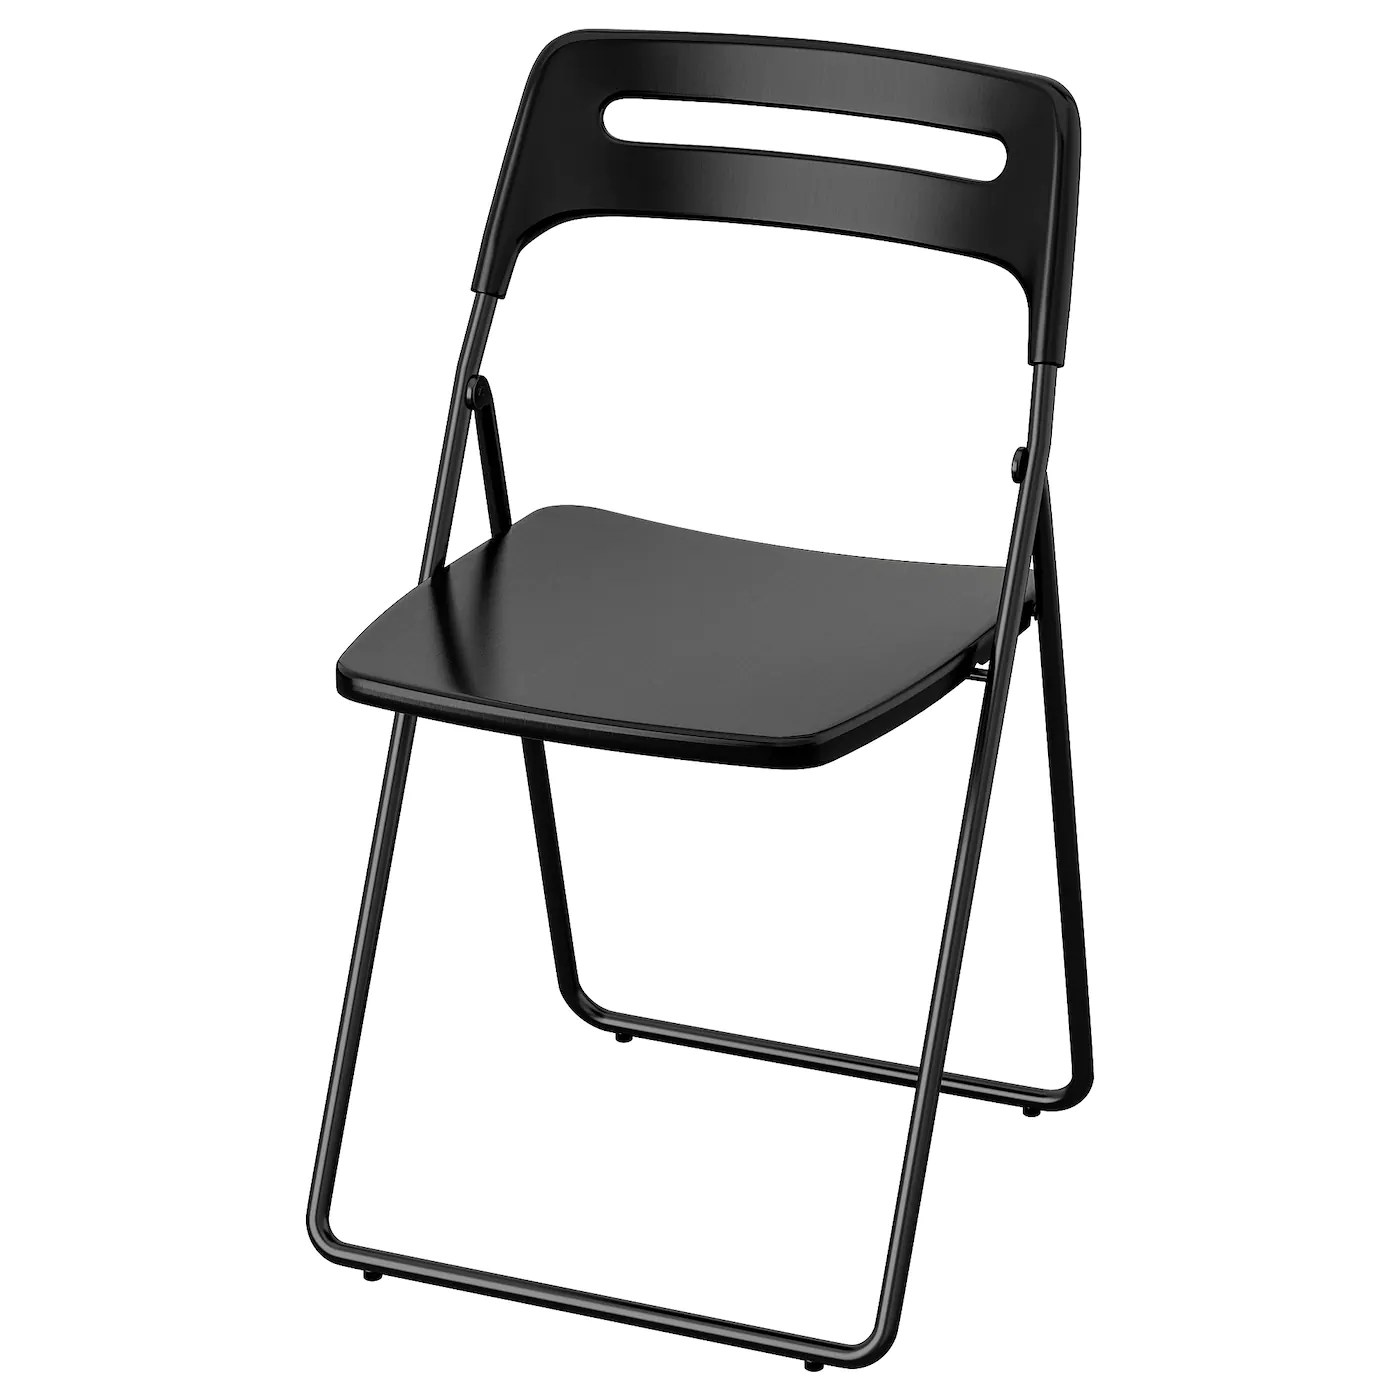 chaises pliantes ikea